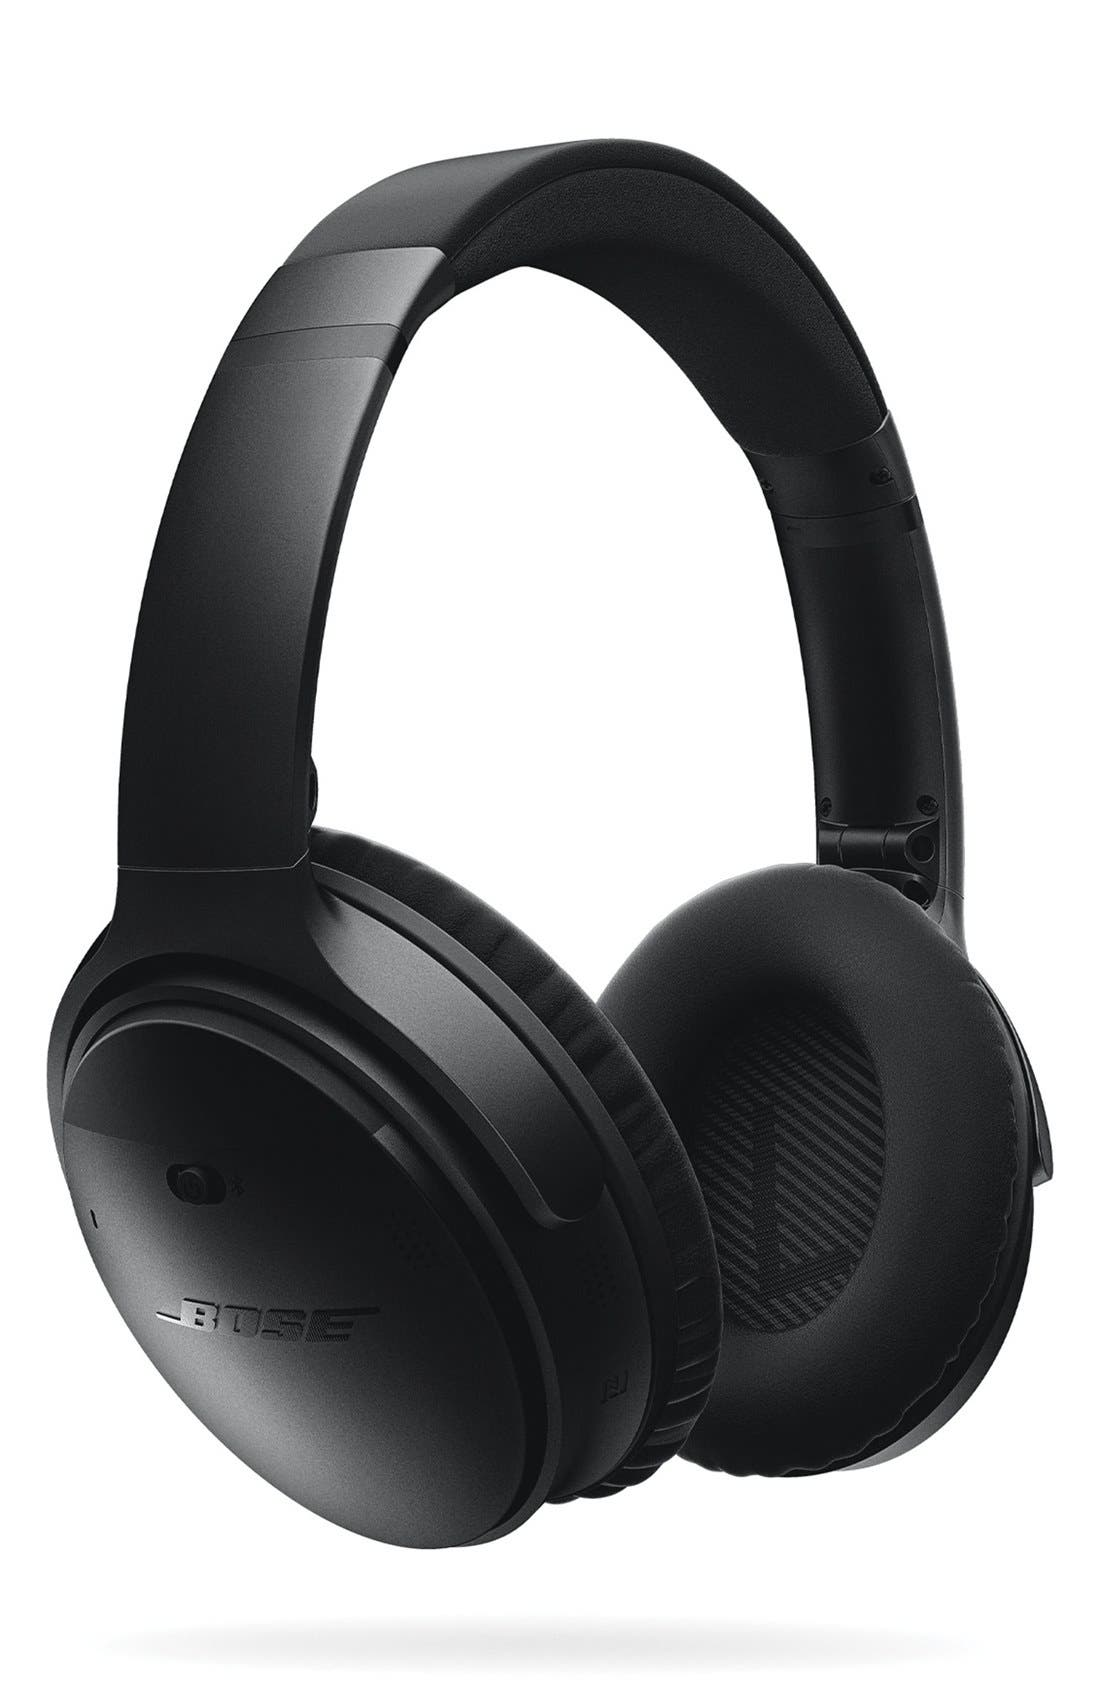 Main Image - Bose® QuietComfort® 35 Acoustic Noise Cancelling® Bluetooth® Headphones